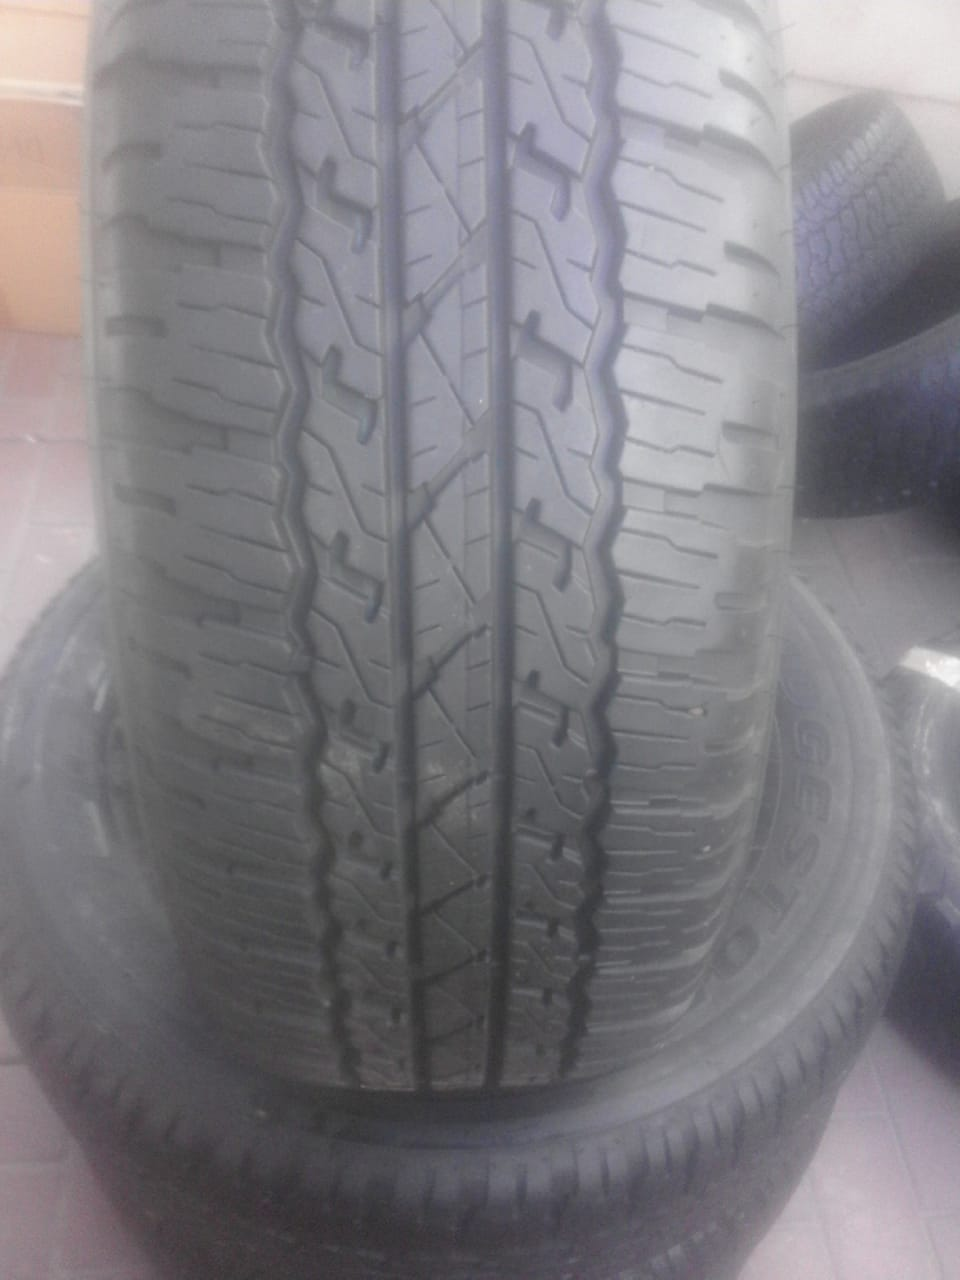 4xBridgestone Dueler AT tyres 265/65/17 close to new!!